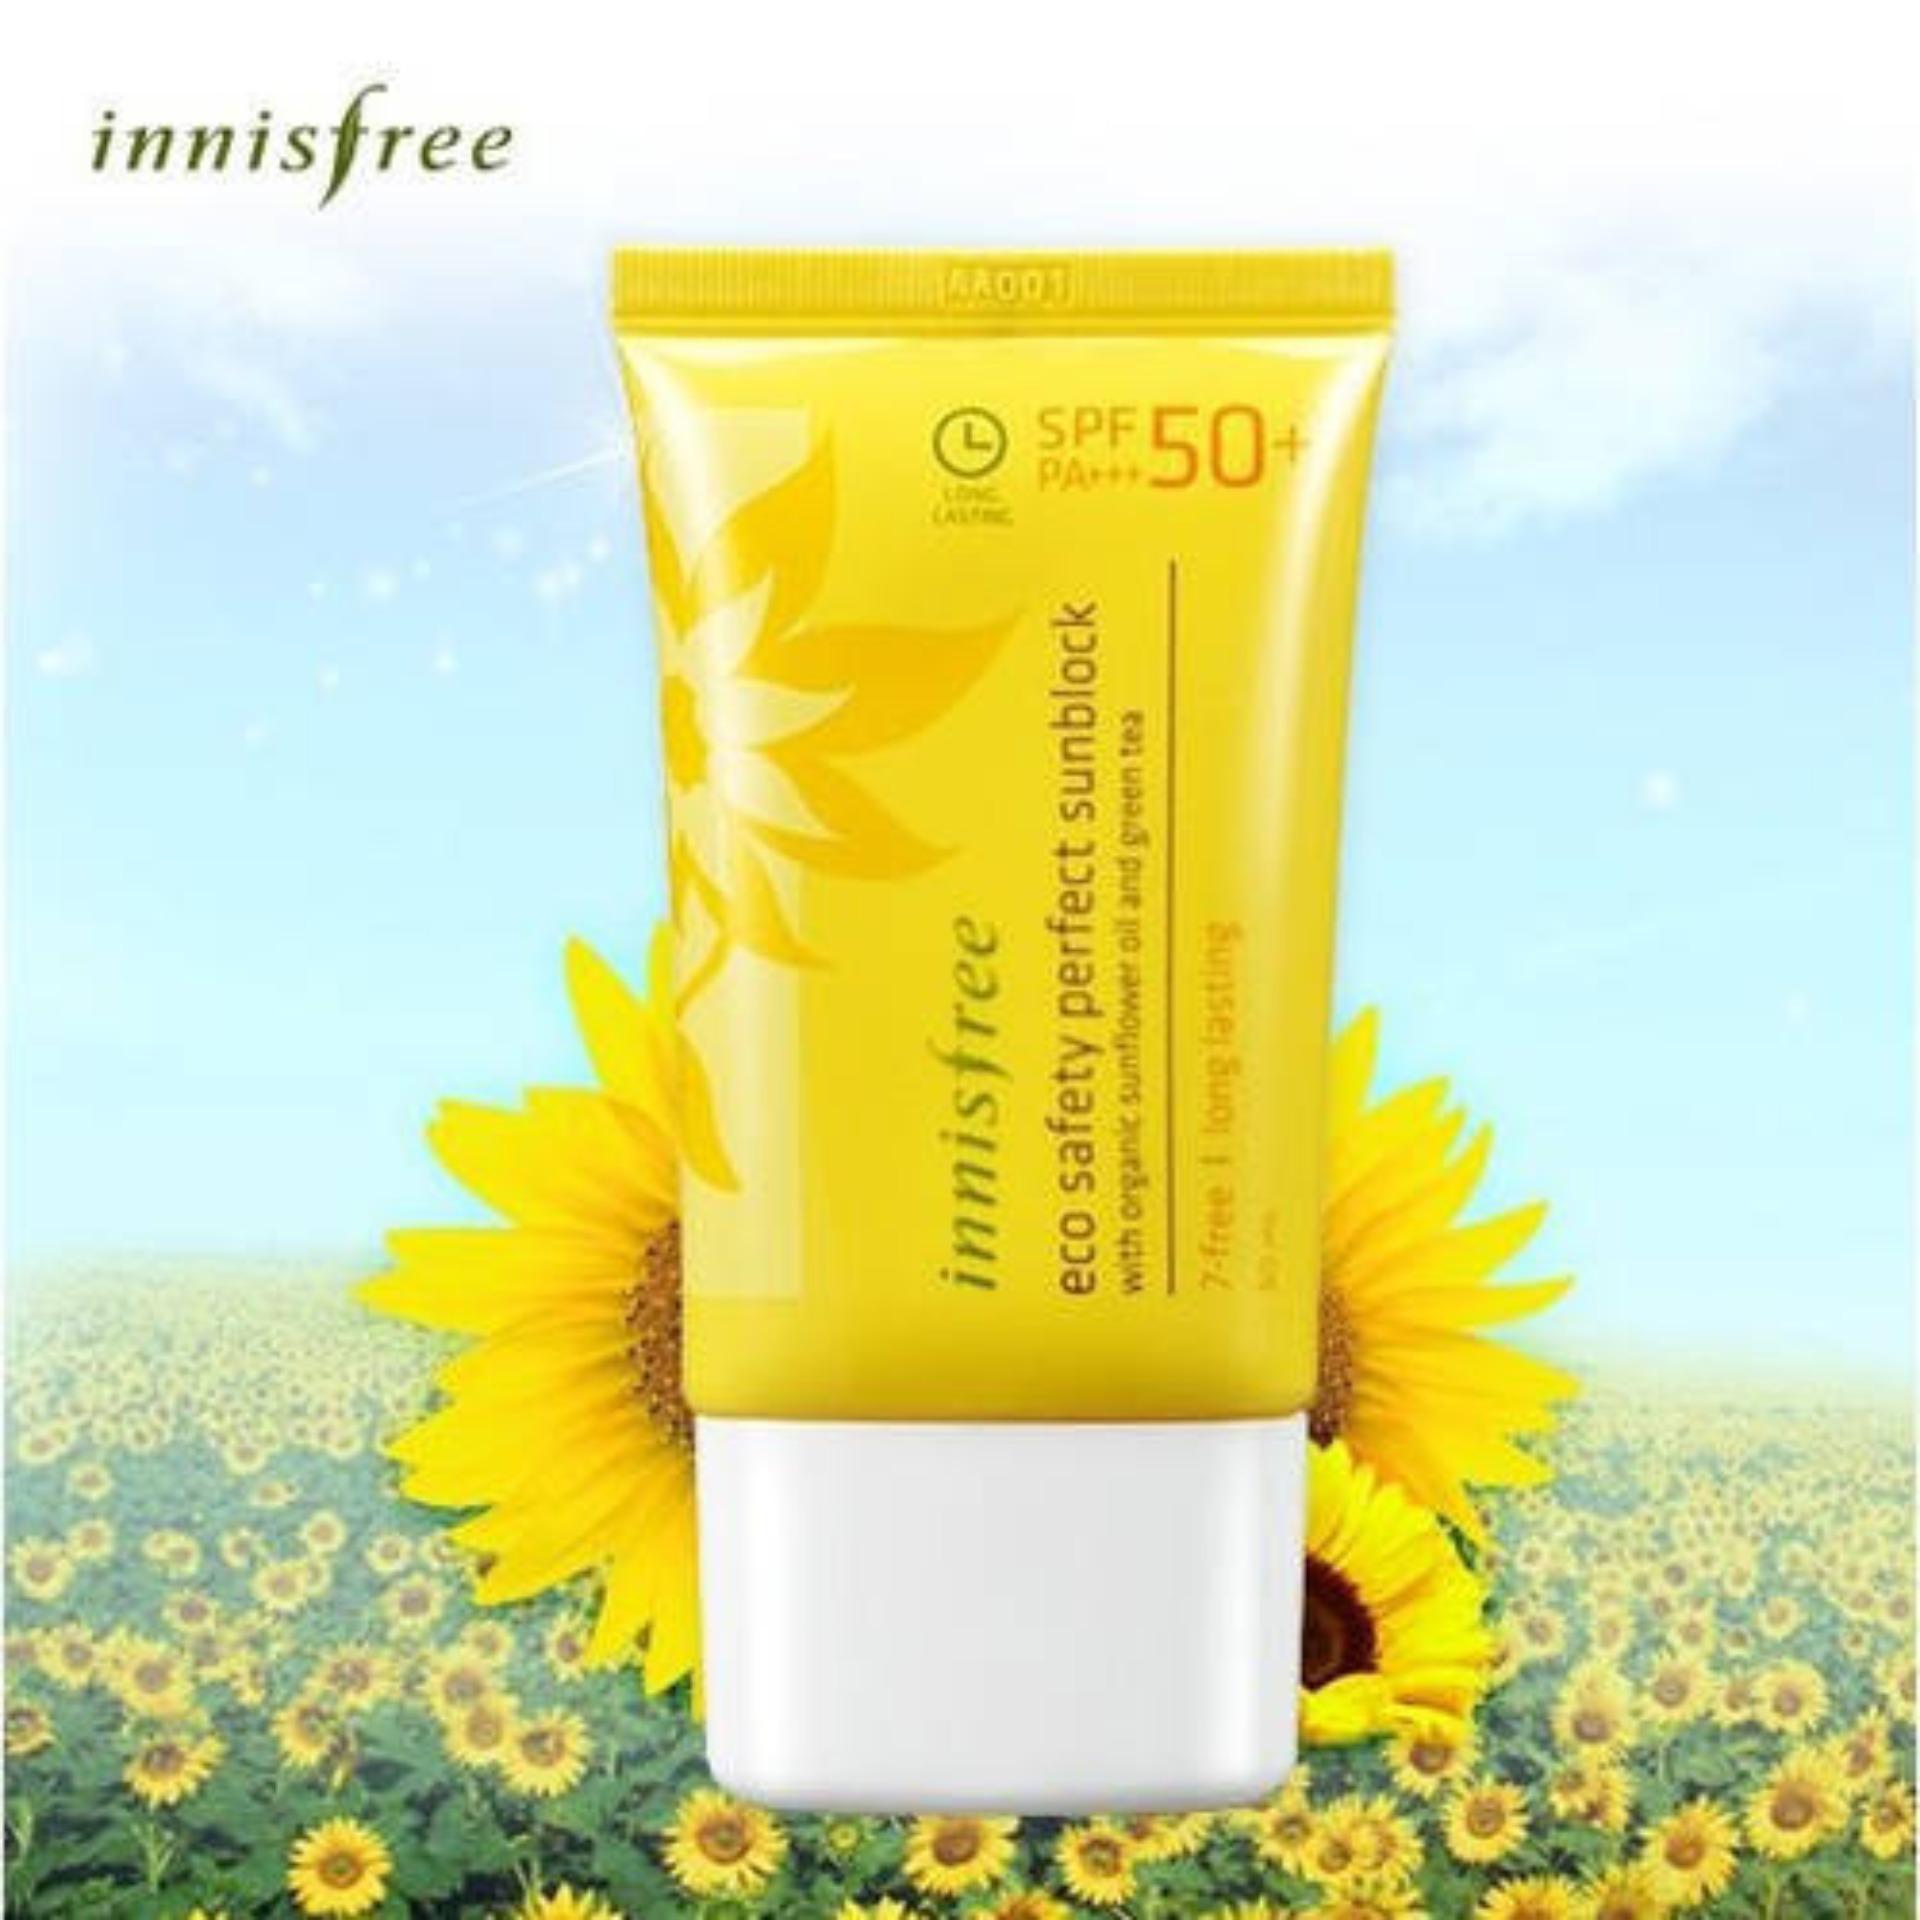 Kem chống nắng Innisfree UV Perfect SPF50+/PA+++ 50ml (New)